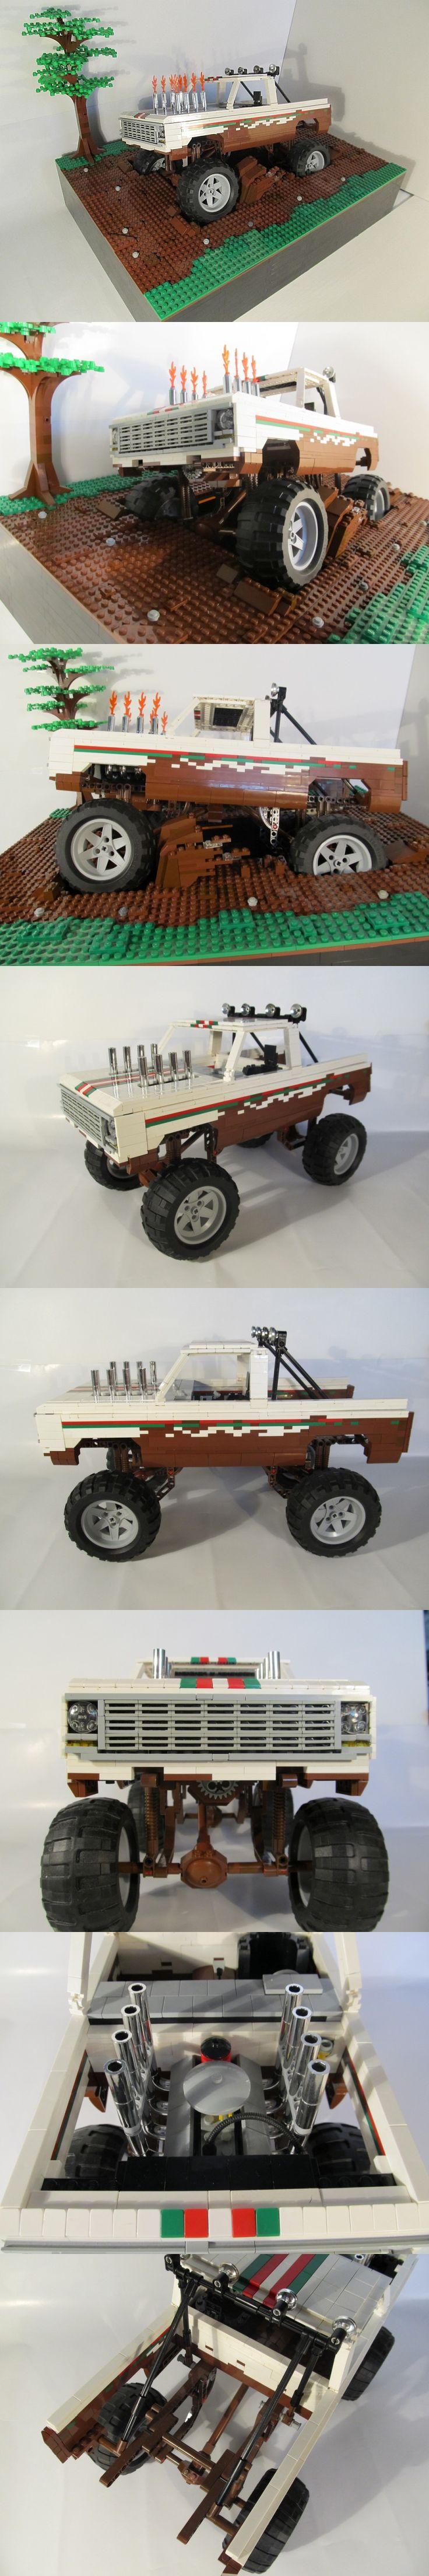 "LEGO ""Octan Racing"" 1973 Chevy pickup mud racer"